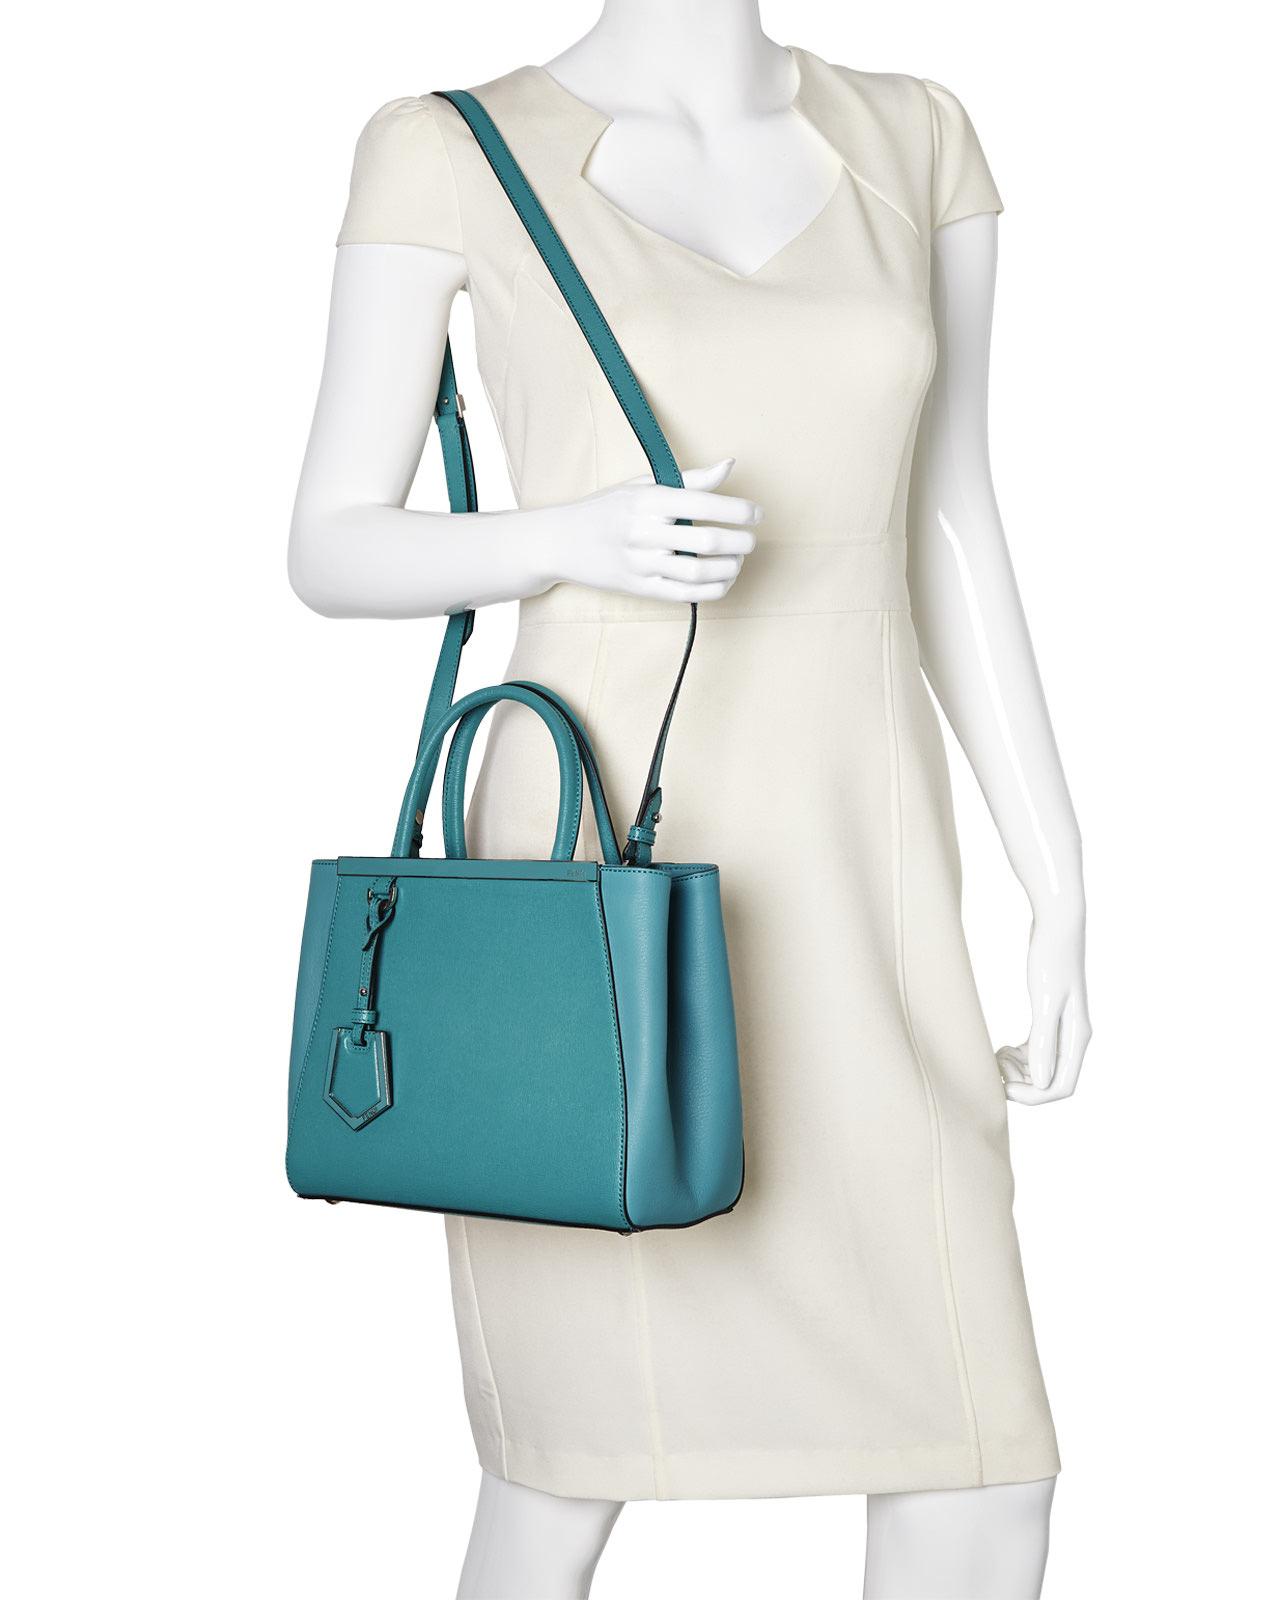 ... quality design 46fb6 69ff2 Fendi 2jours Monster Handbag Leather Medium  At 1stdibs .. ... b28d52d0ed852